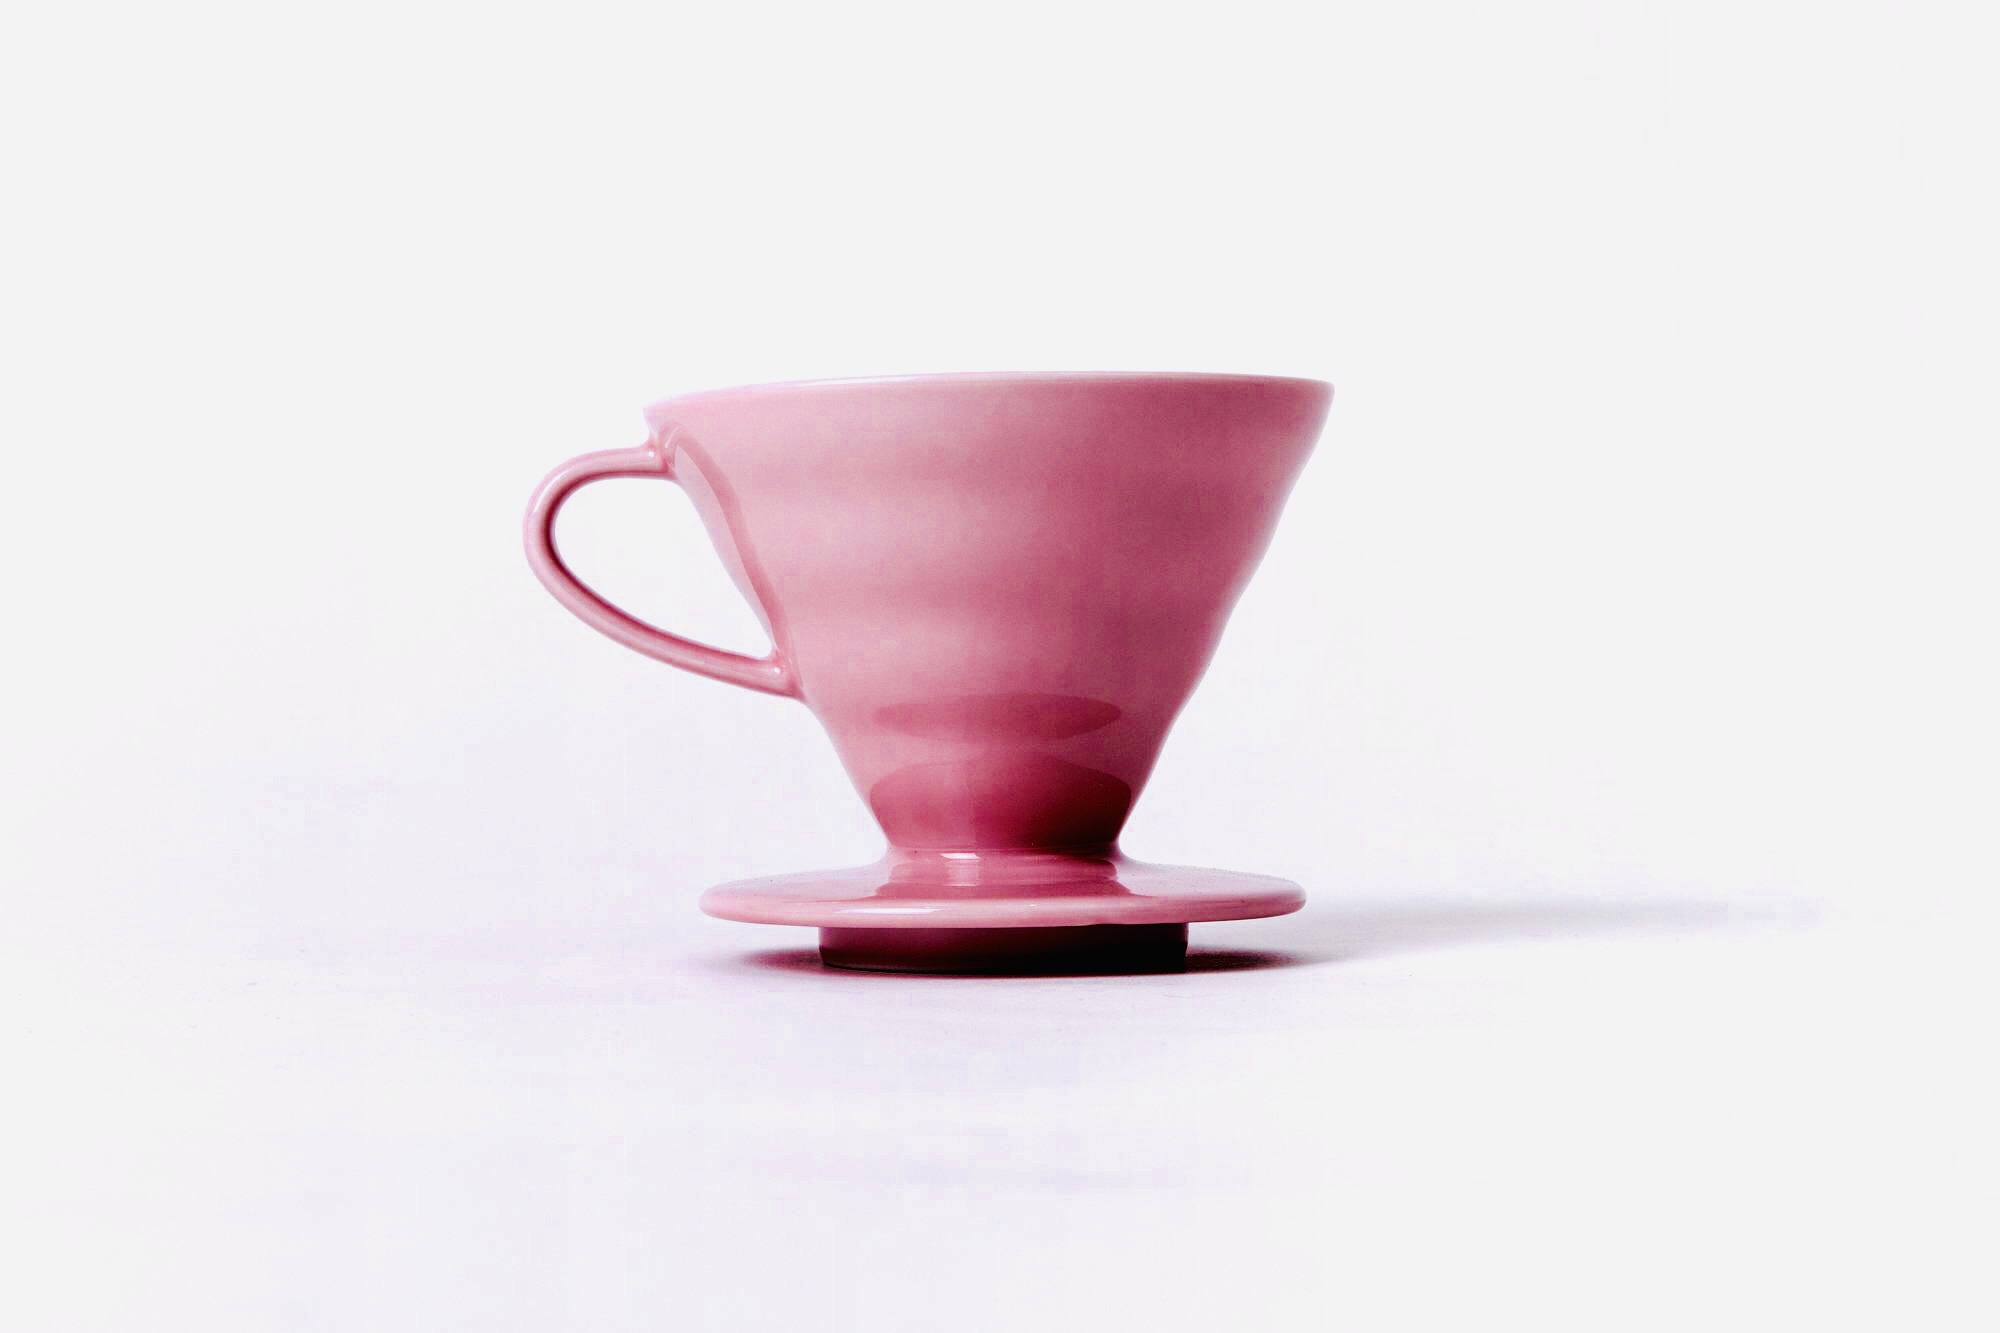 Hario V60 Ceramic pour-over cup, $25